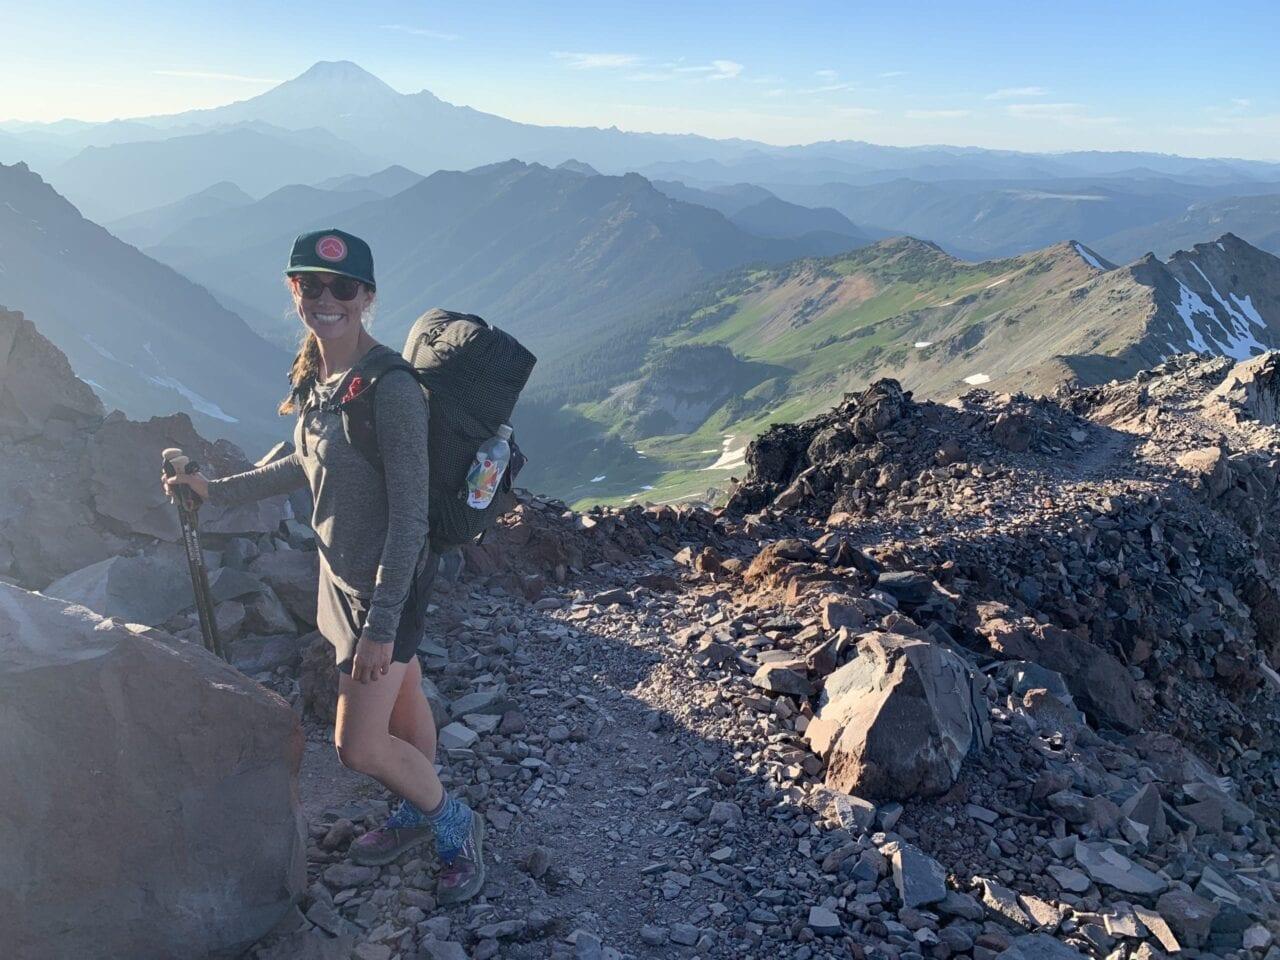 A woman hiking on a mountain.